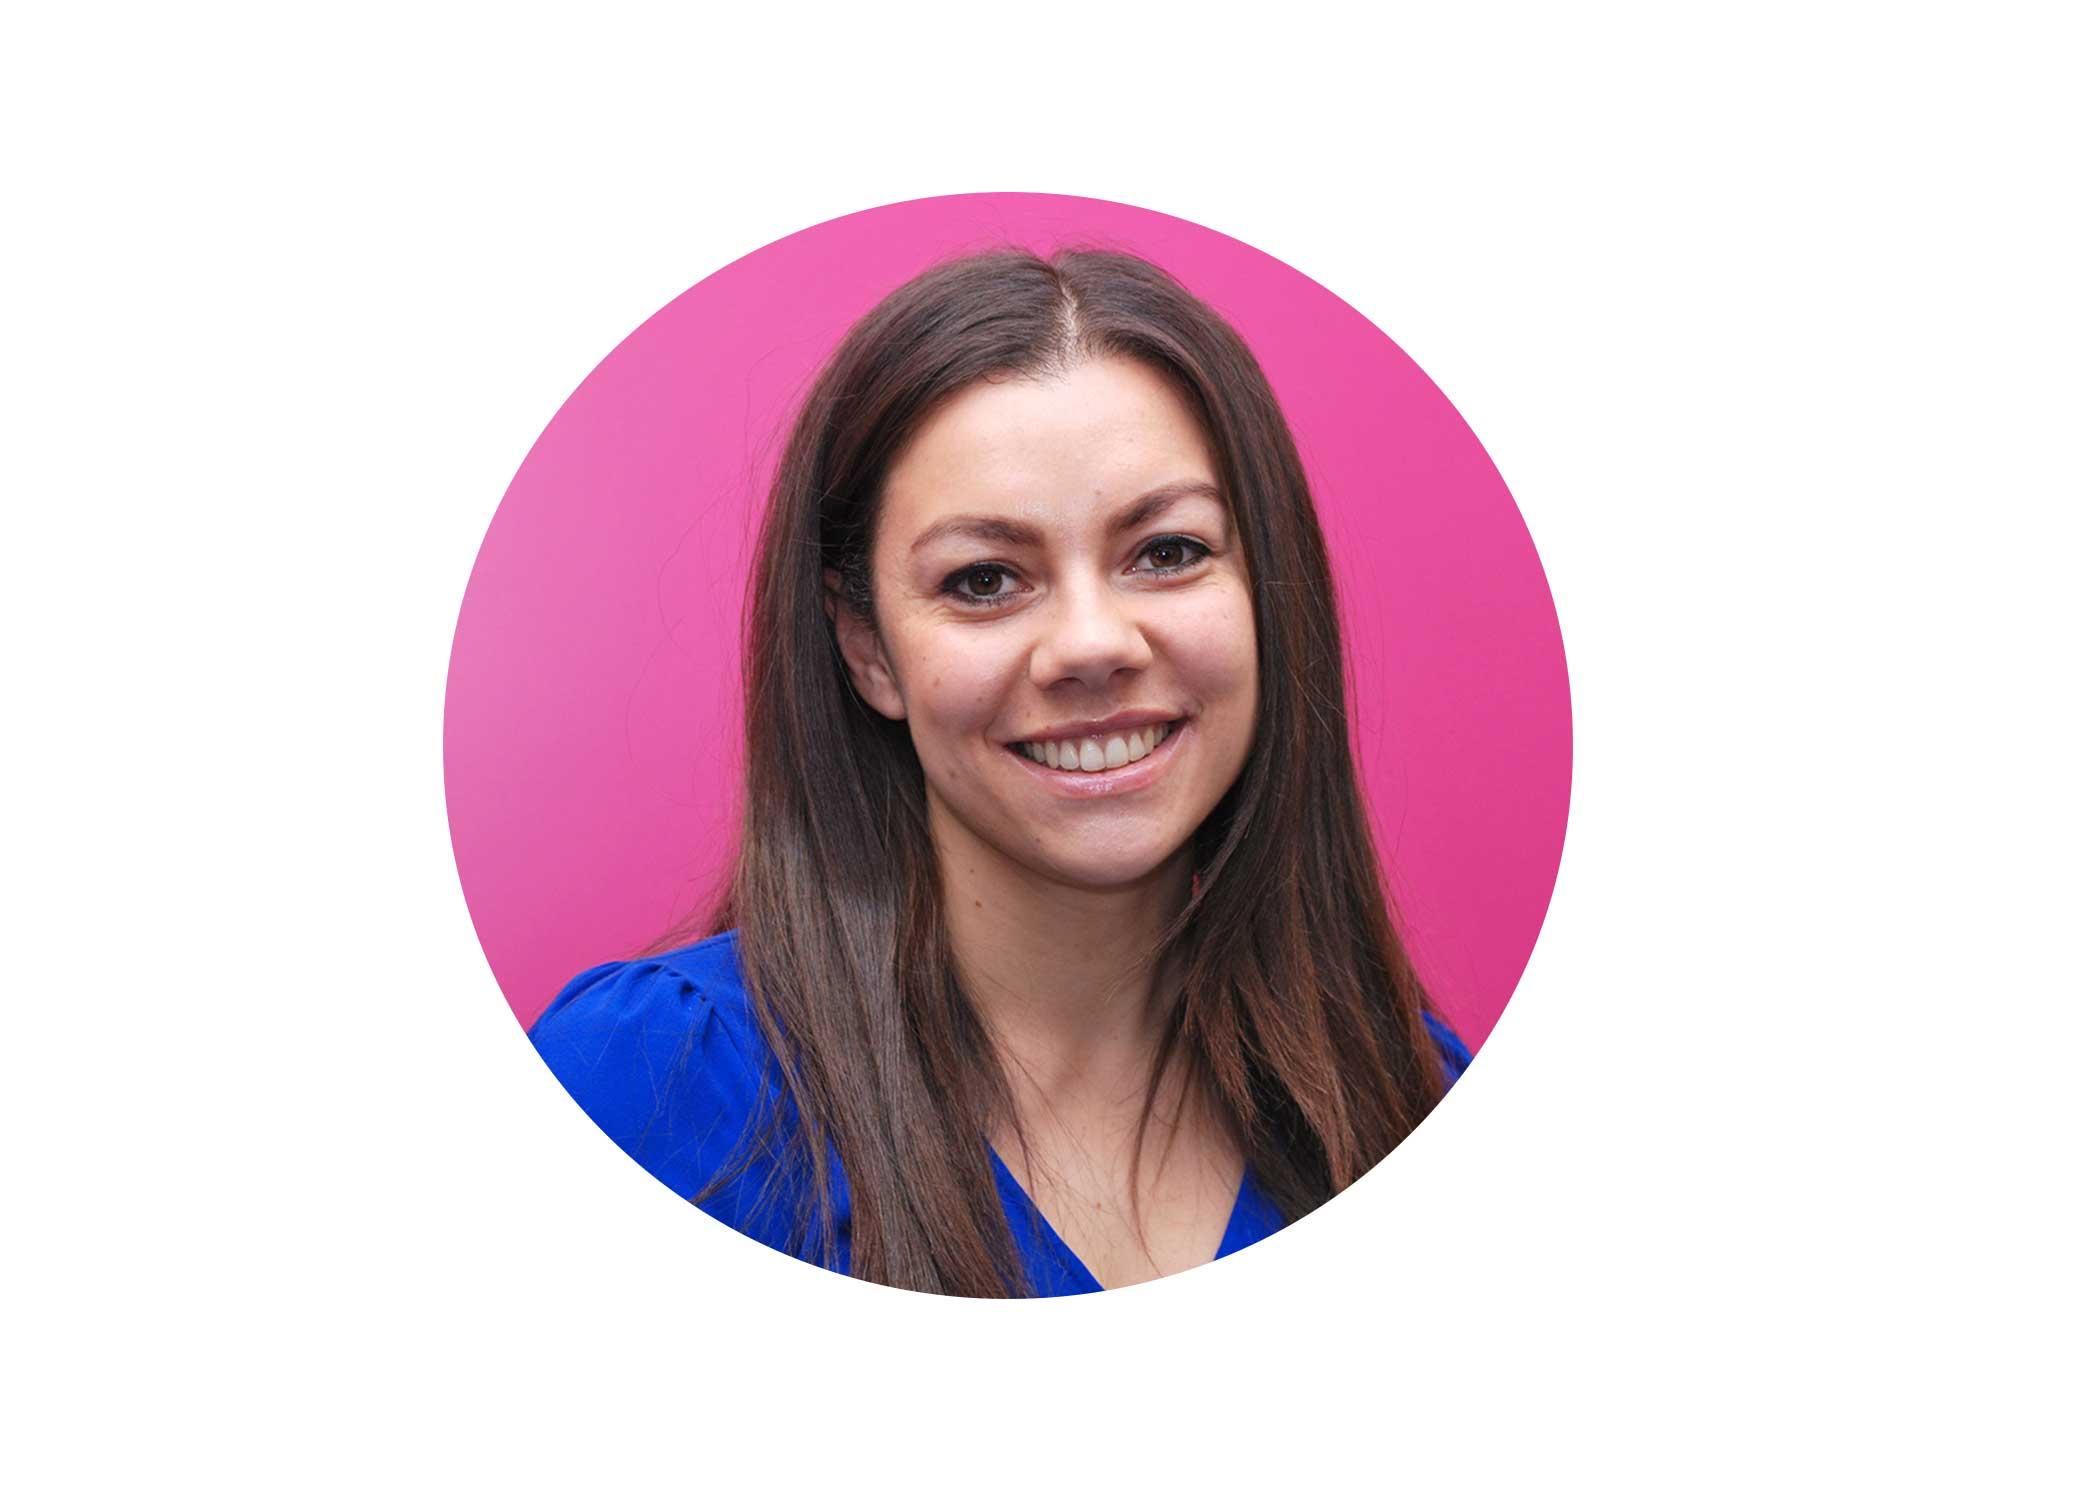 Sarah McLarty, ATM Consultant